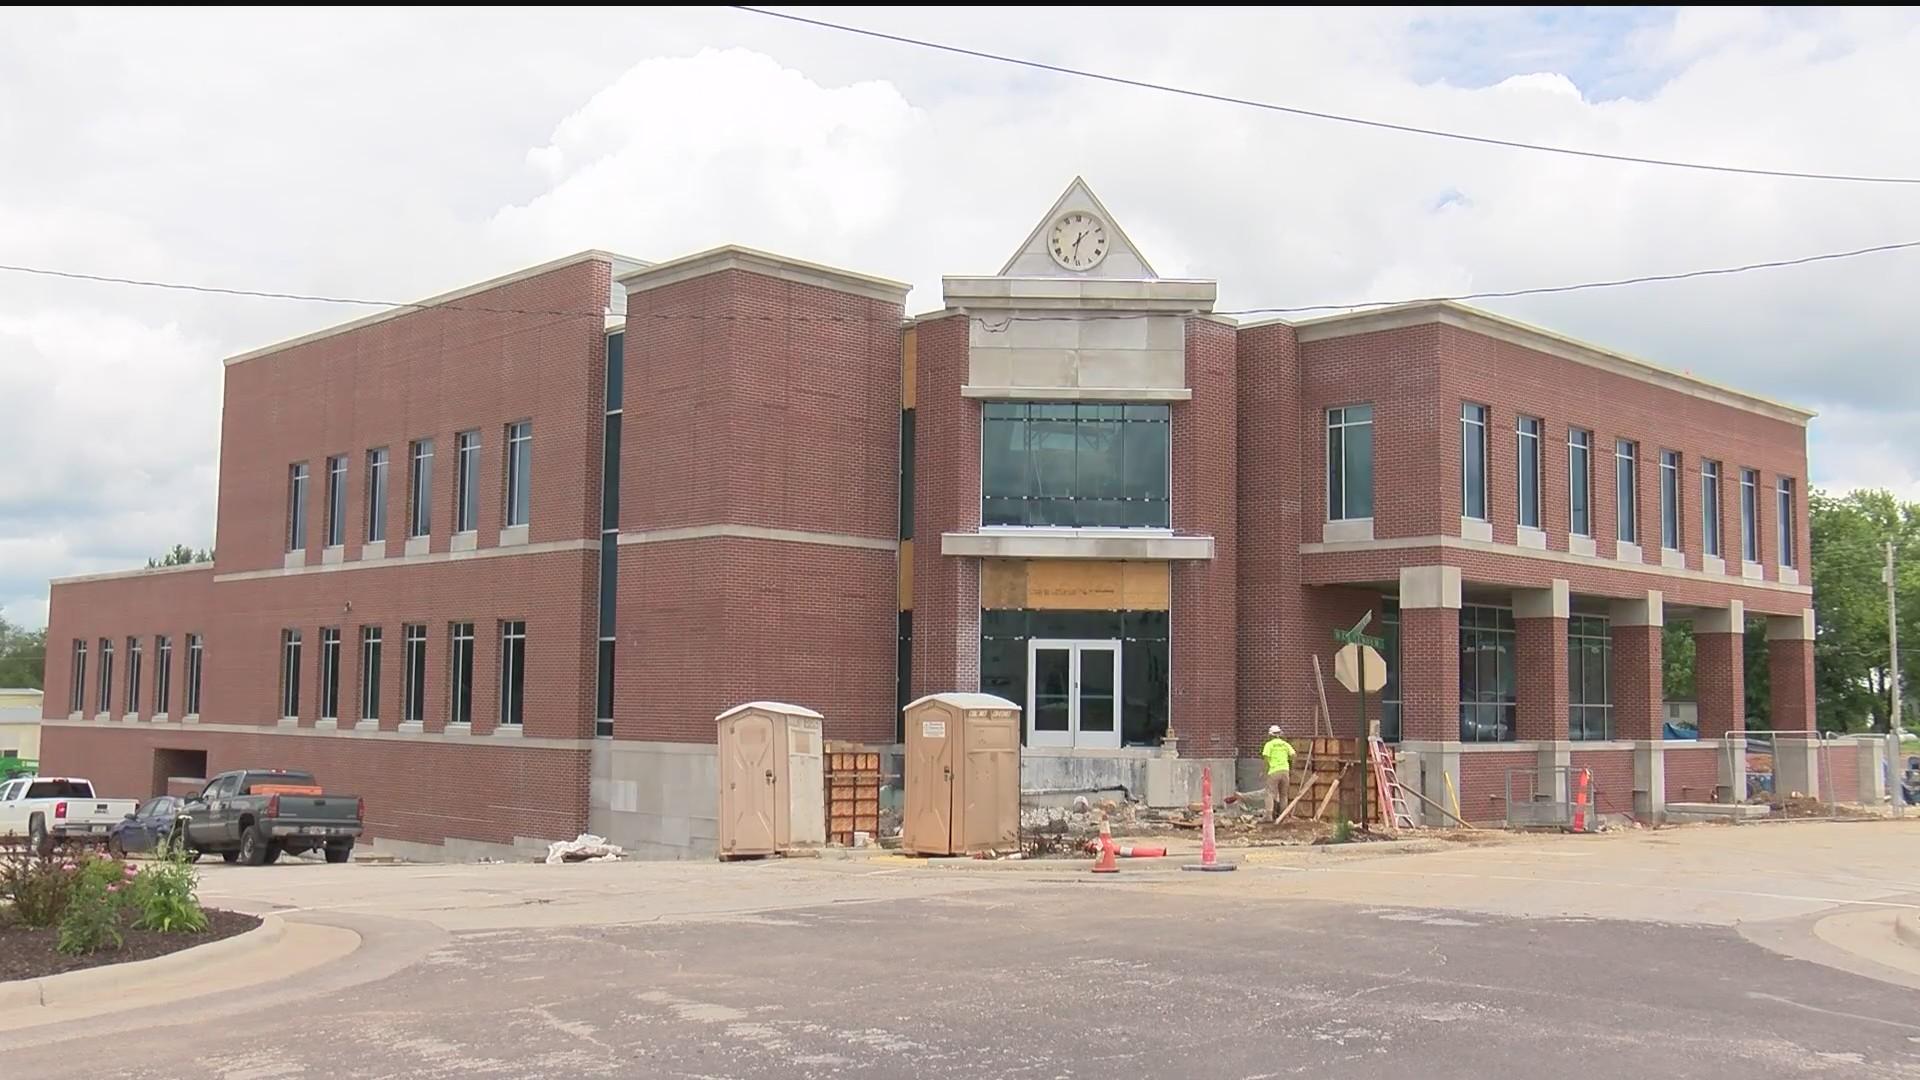 Webster County Jail